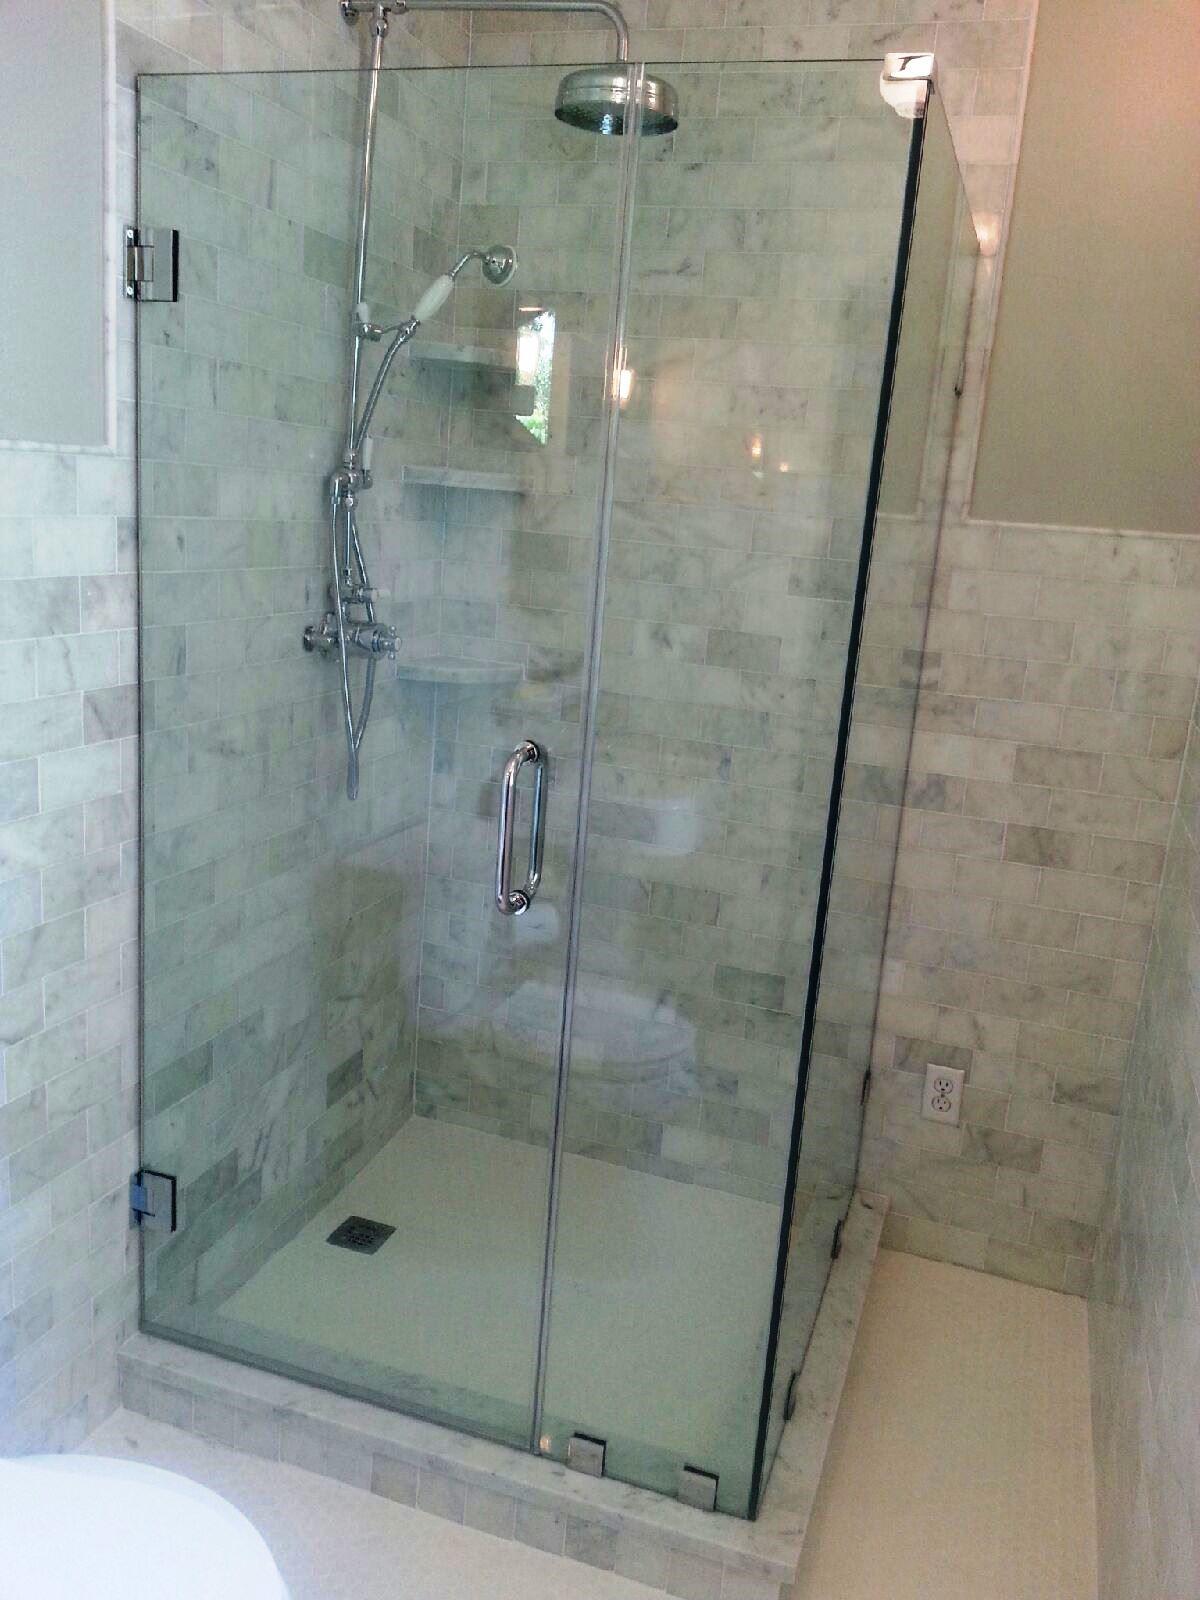 bathroom glass doors design 24 glass shower bathroom designs shower enclosures and tub enclosures that will turn your bathroom into shower enclosures and tub enclosures that will turn your bathroom into